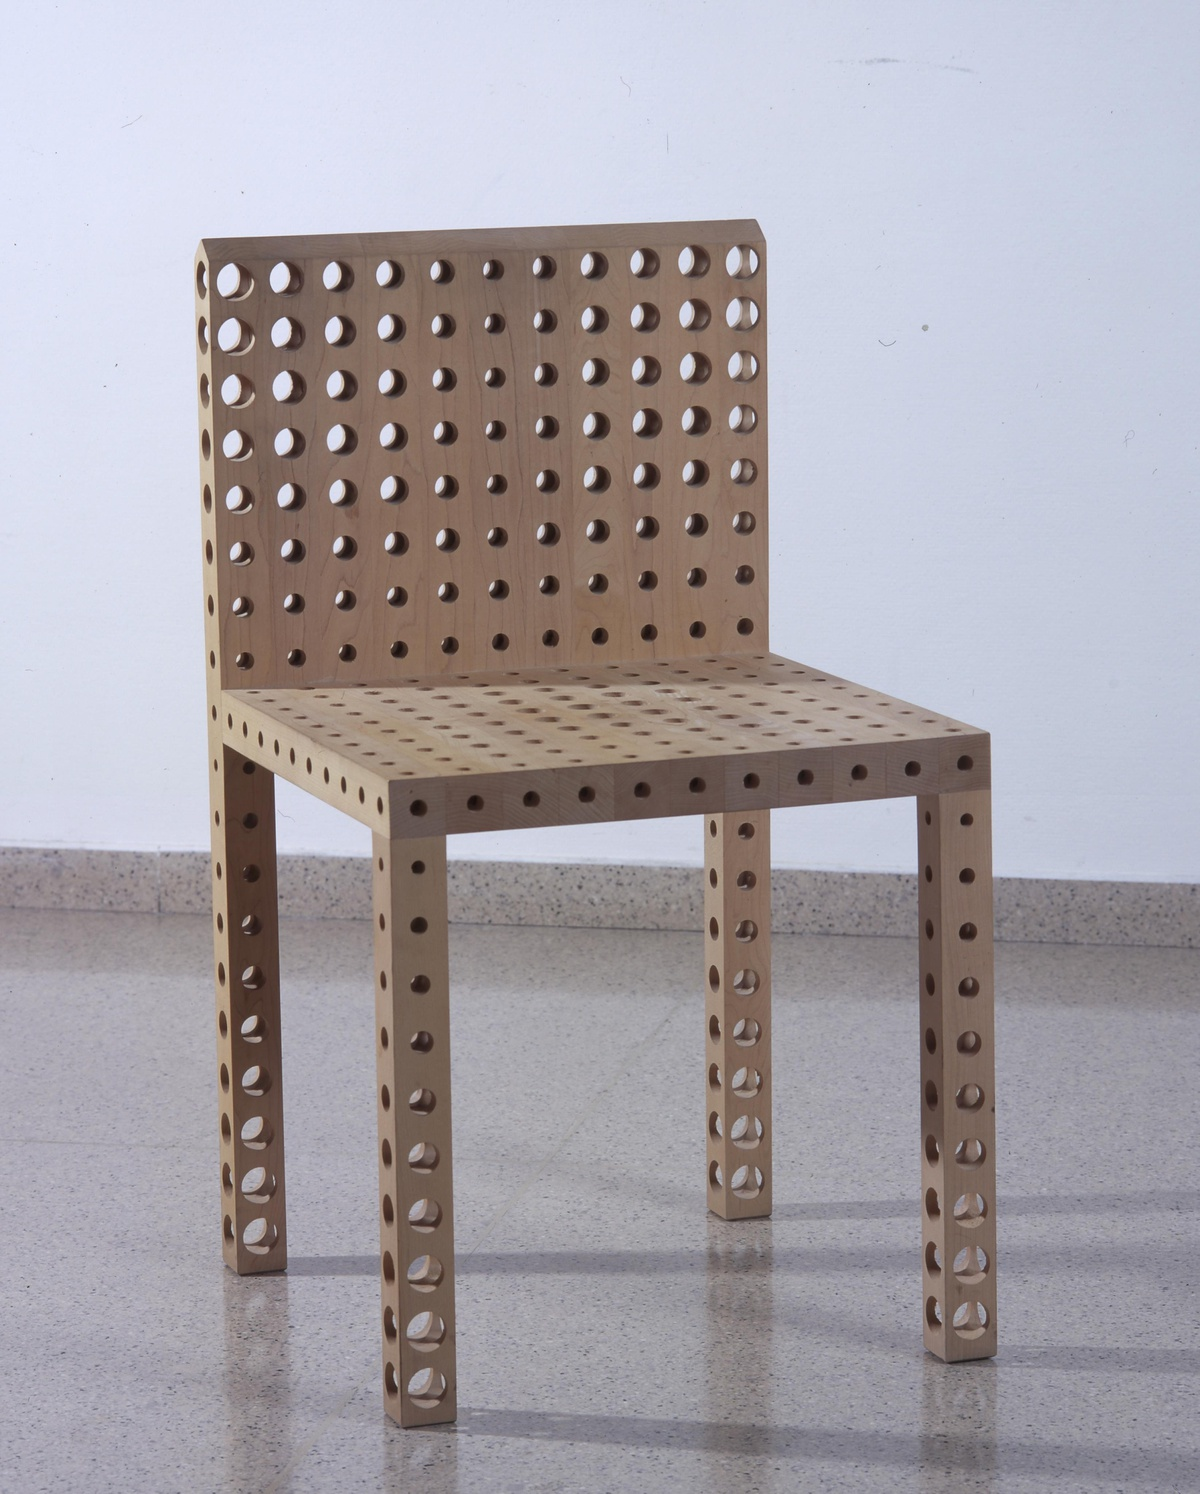 Seat with holes designed by Gijs Bakker (1989)